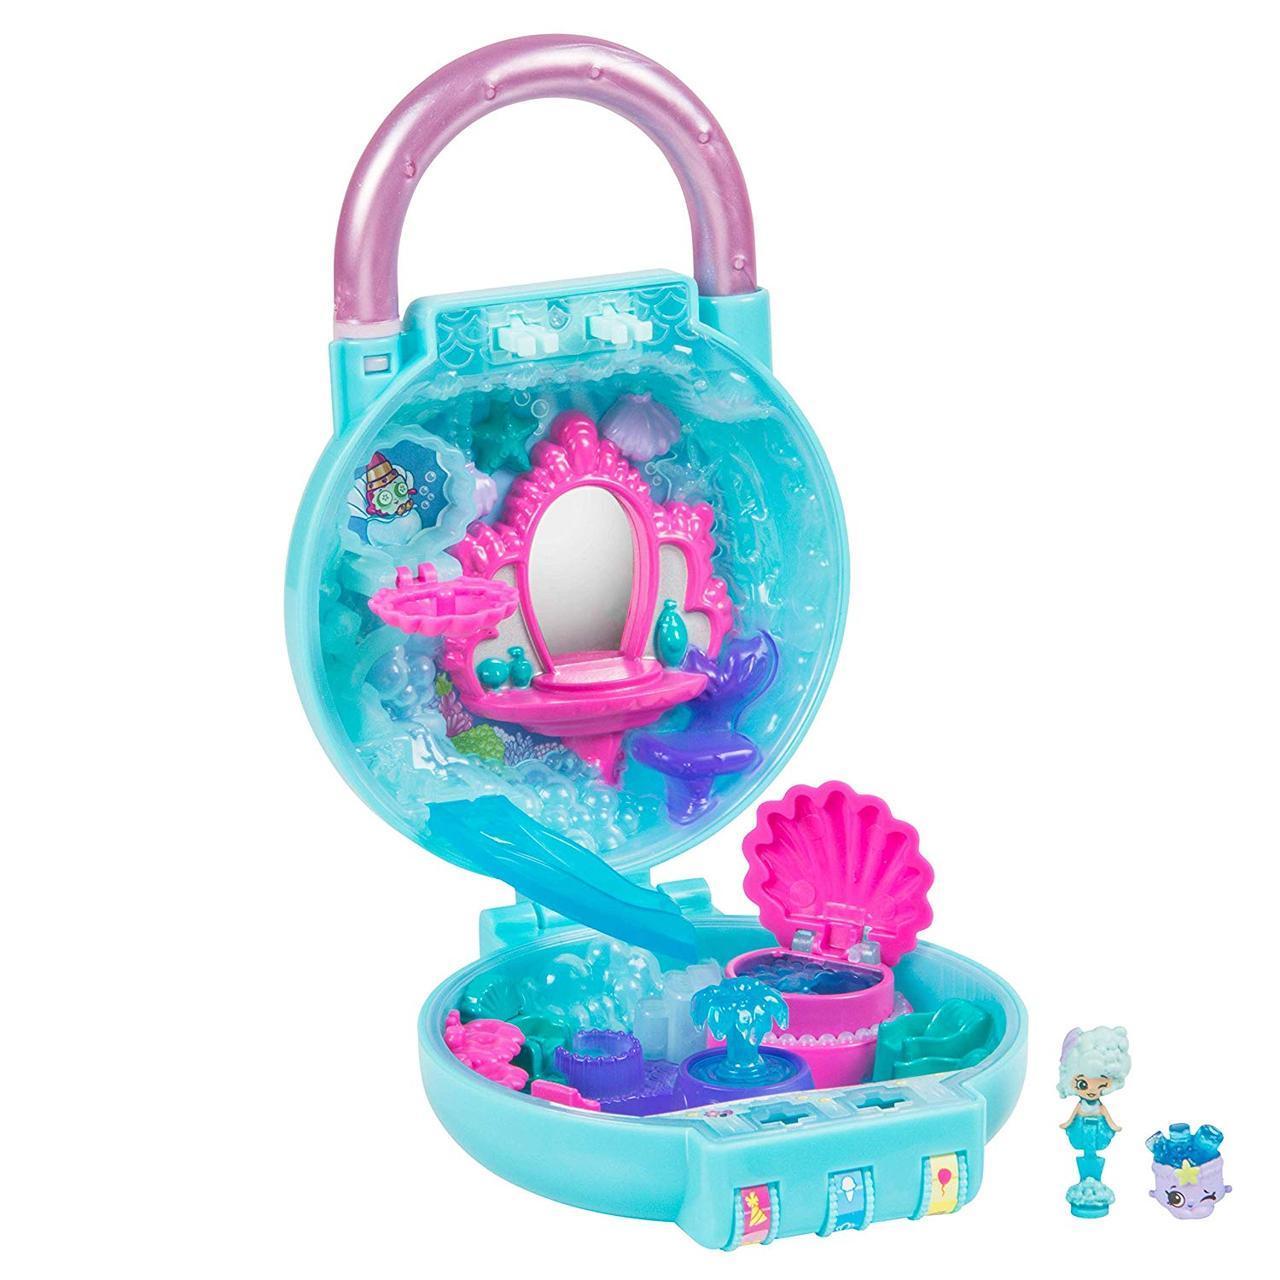 Shopkins Секретный Замок Секреты Лили - День спа Lil' Secrets Secret Lock - Bubbling Beauty Day Spa